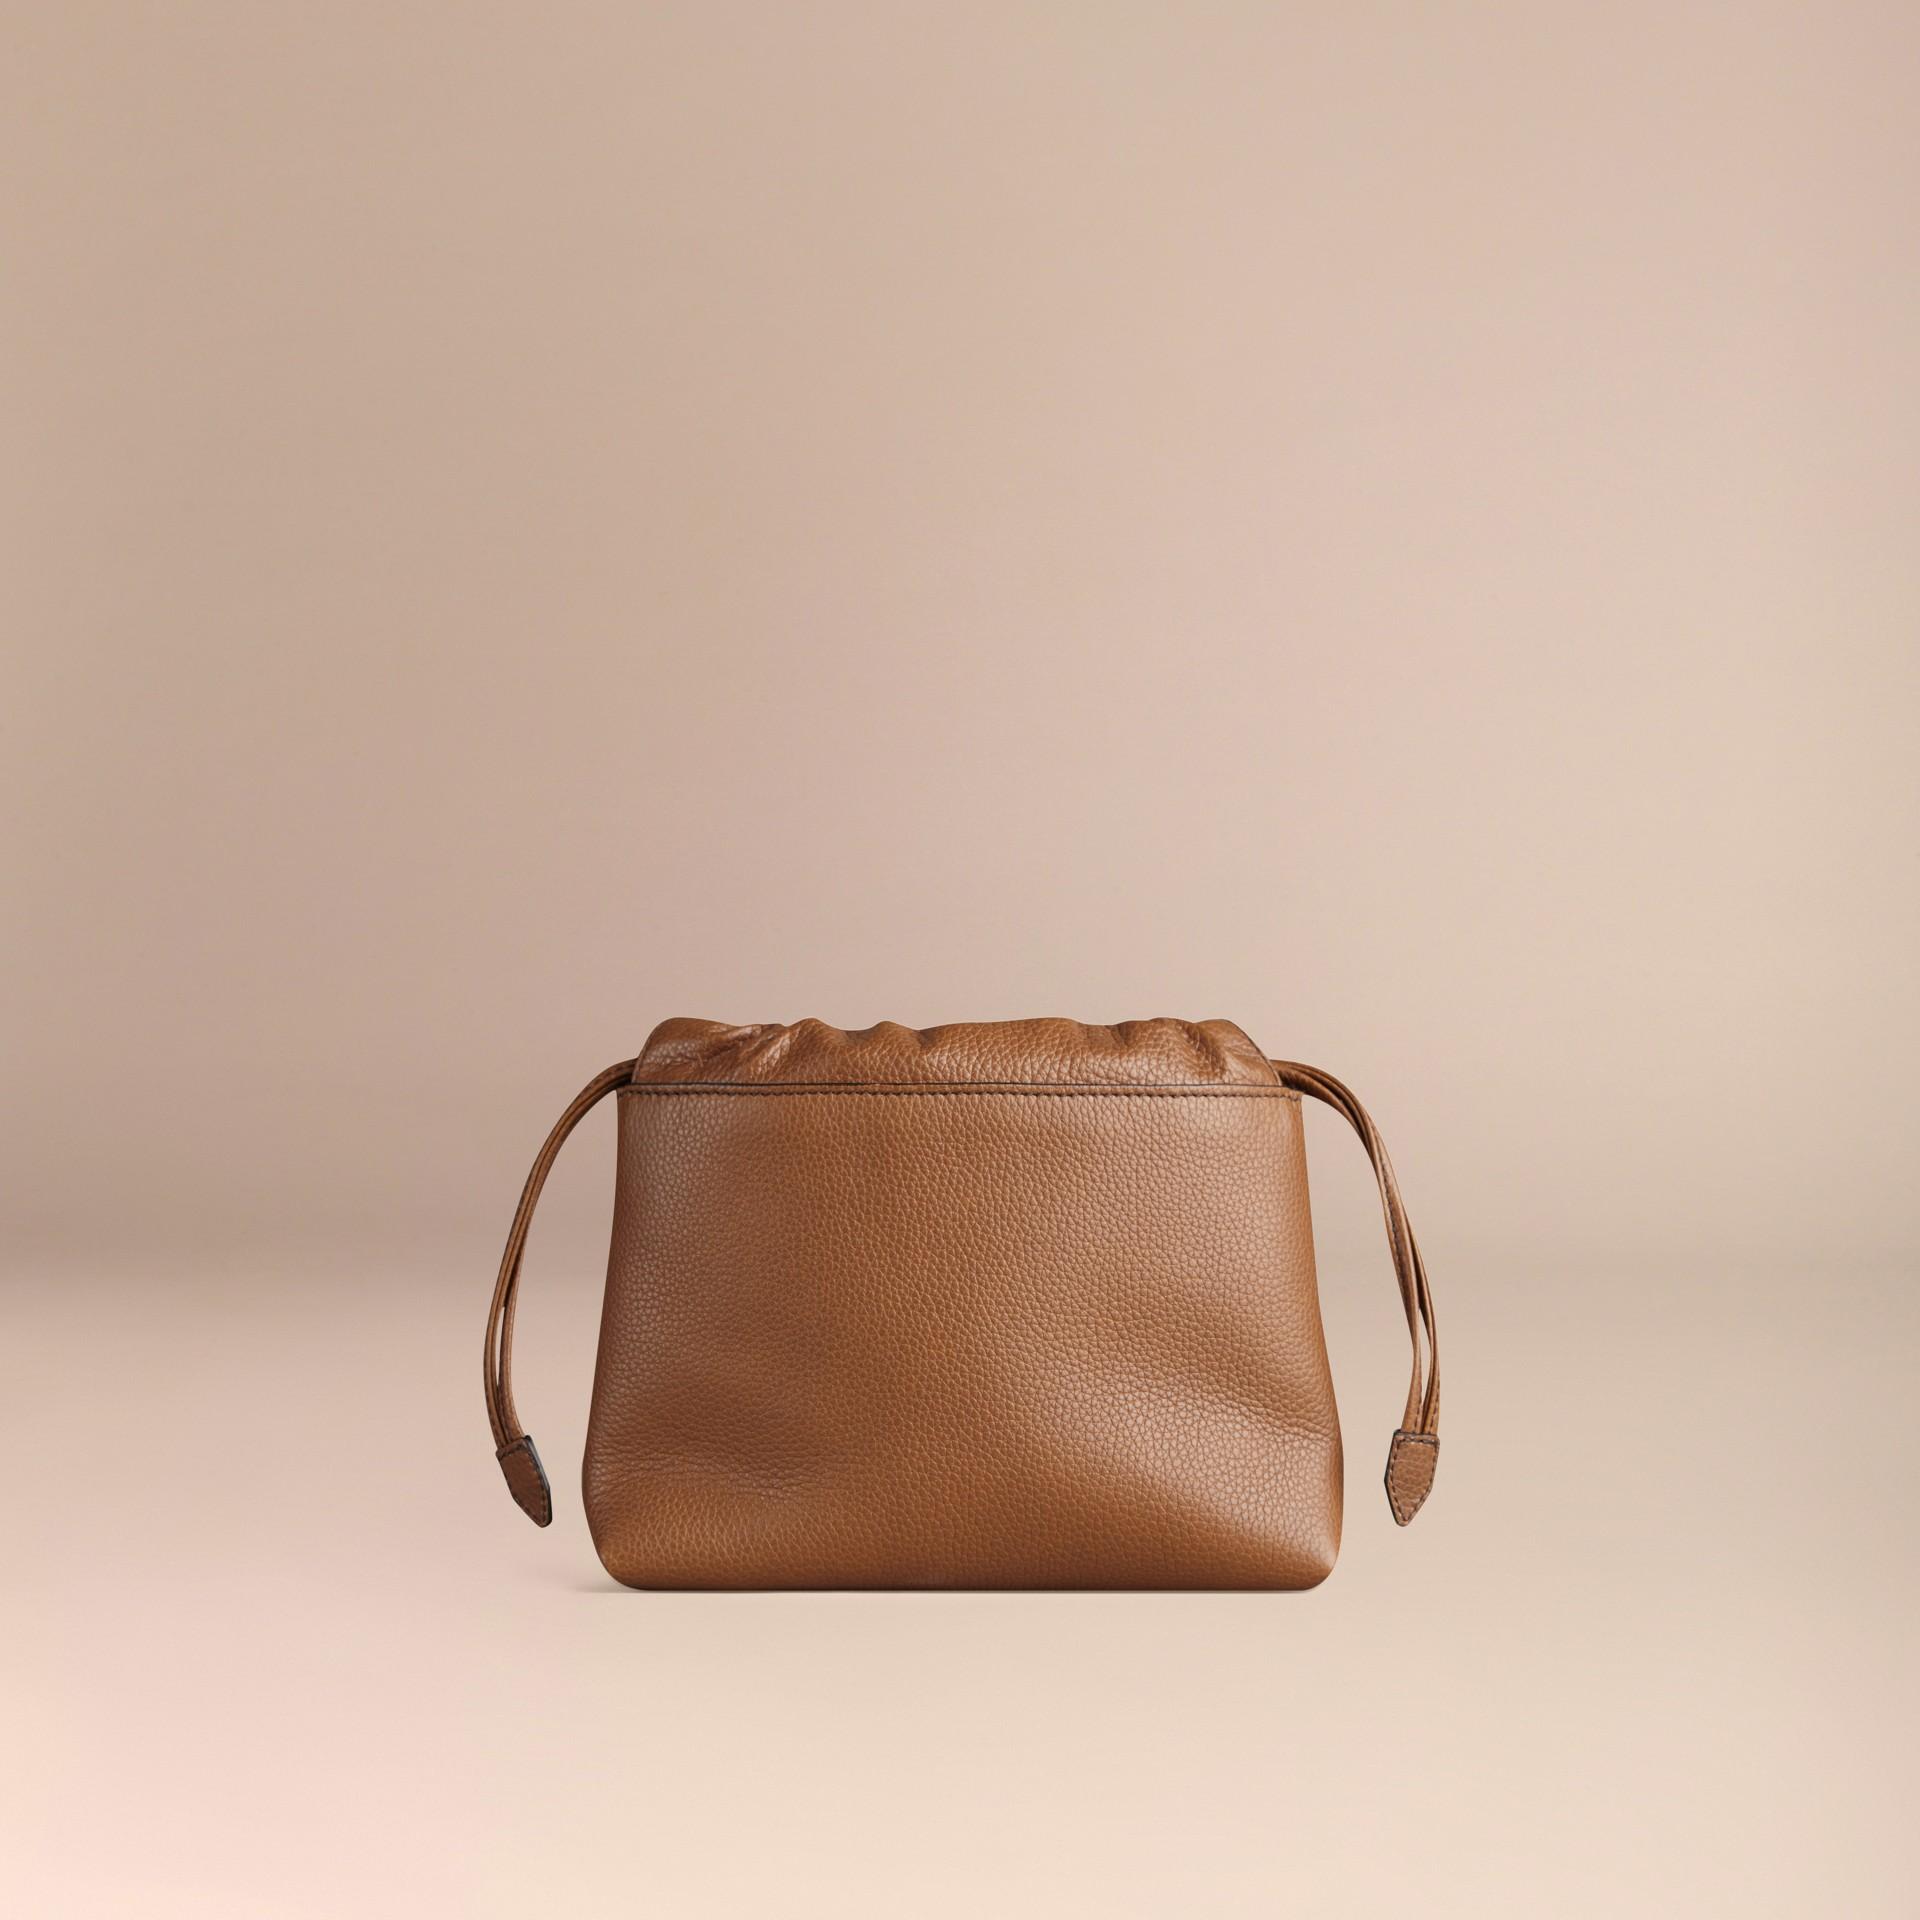 Hâle Sac The Mini Crush en cuir grené Hâle - photo de la galerie 4